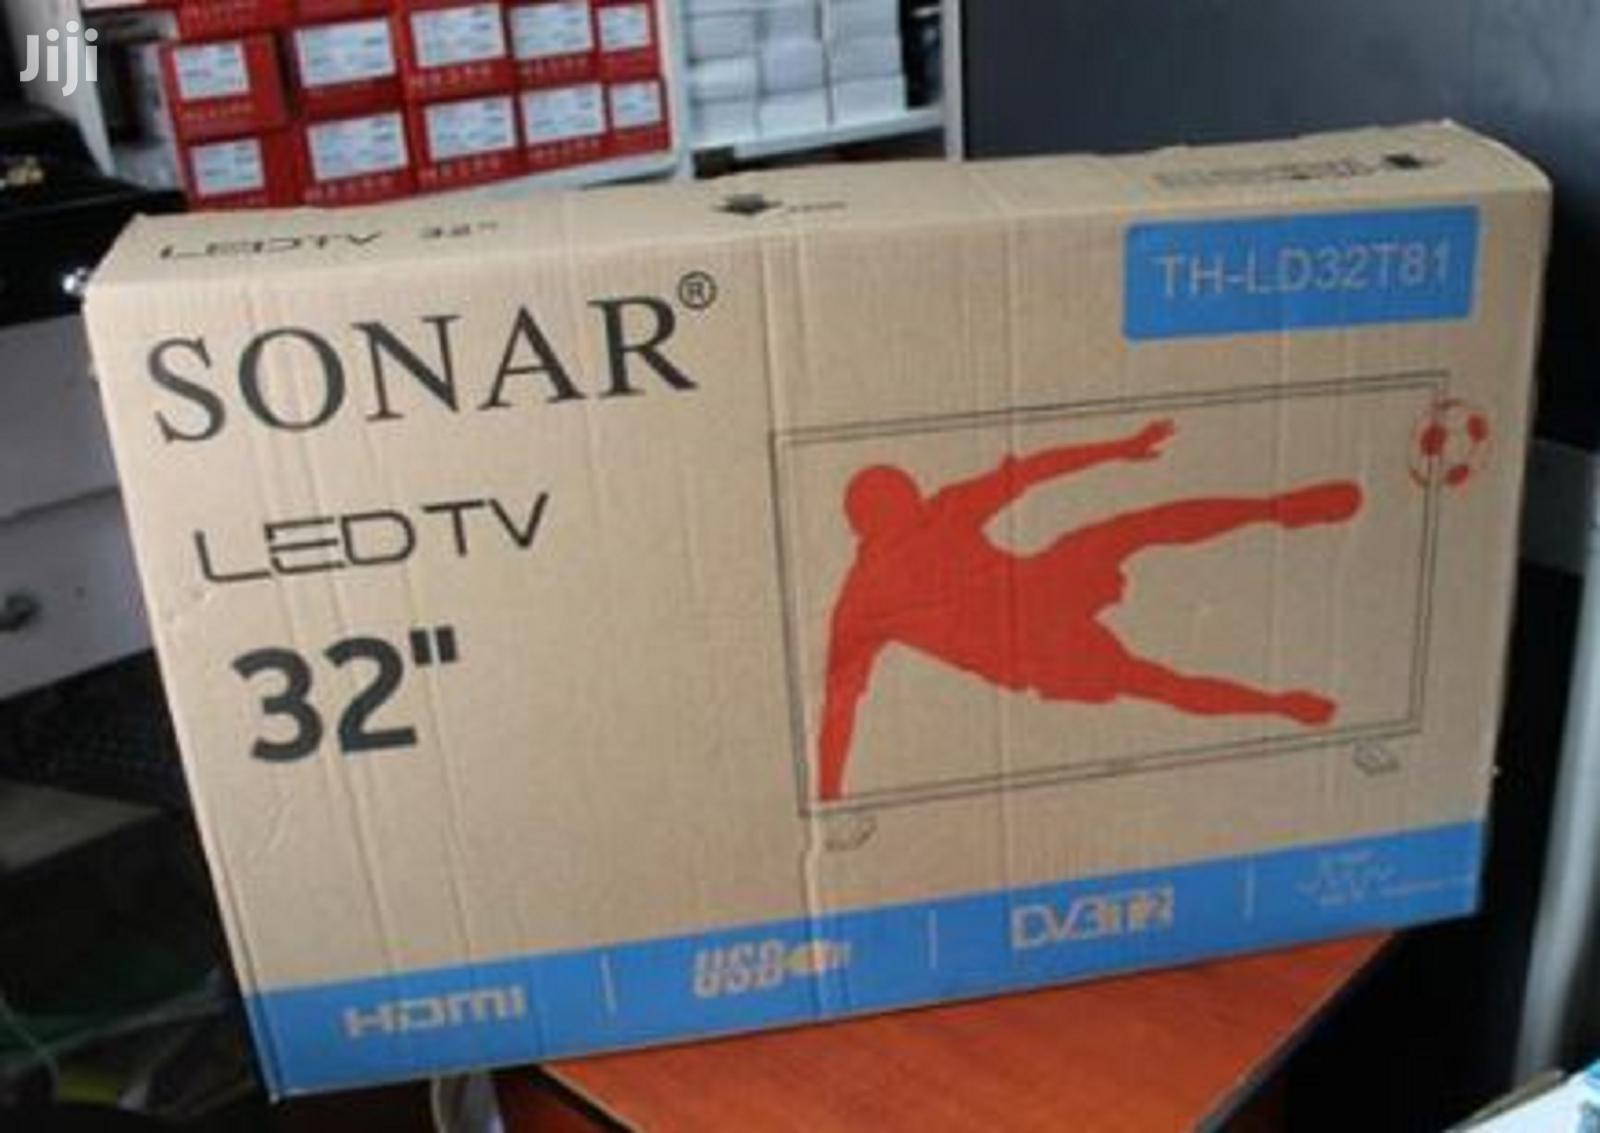 Sonar Digital LED TV 32 Inch